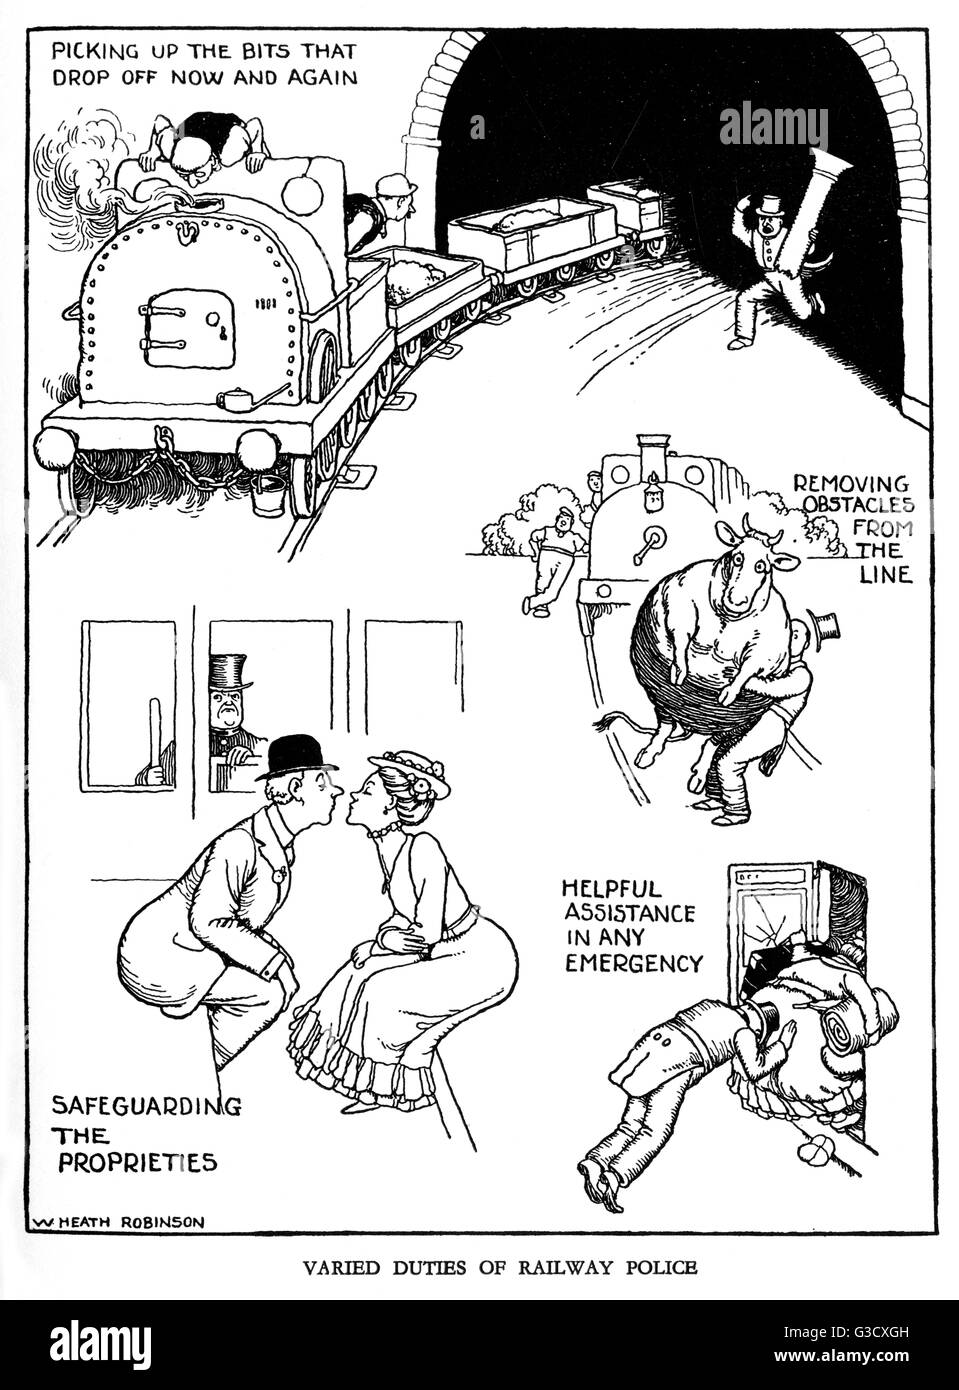 Illustration, Railway Ribaldry by W Heath Robinson -- Varied duties of railway police.       Date: 1935 - Stock Image